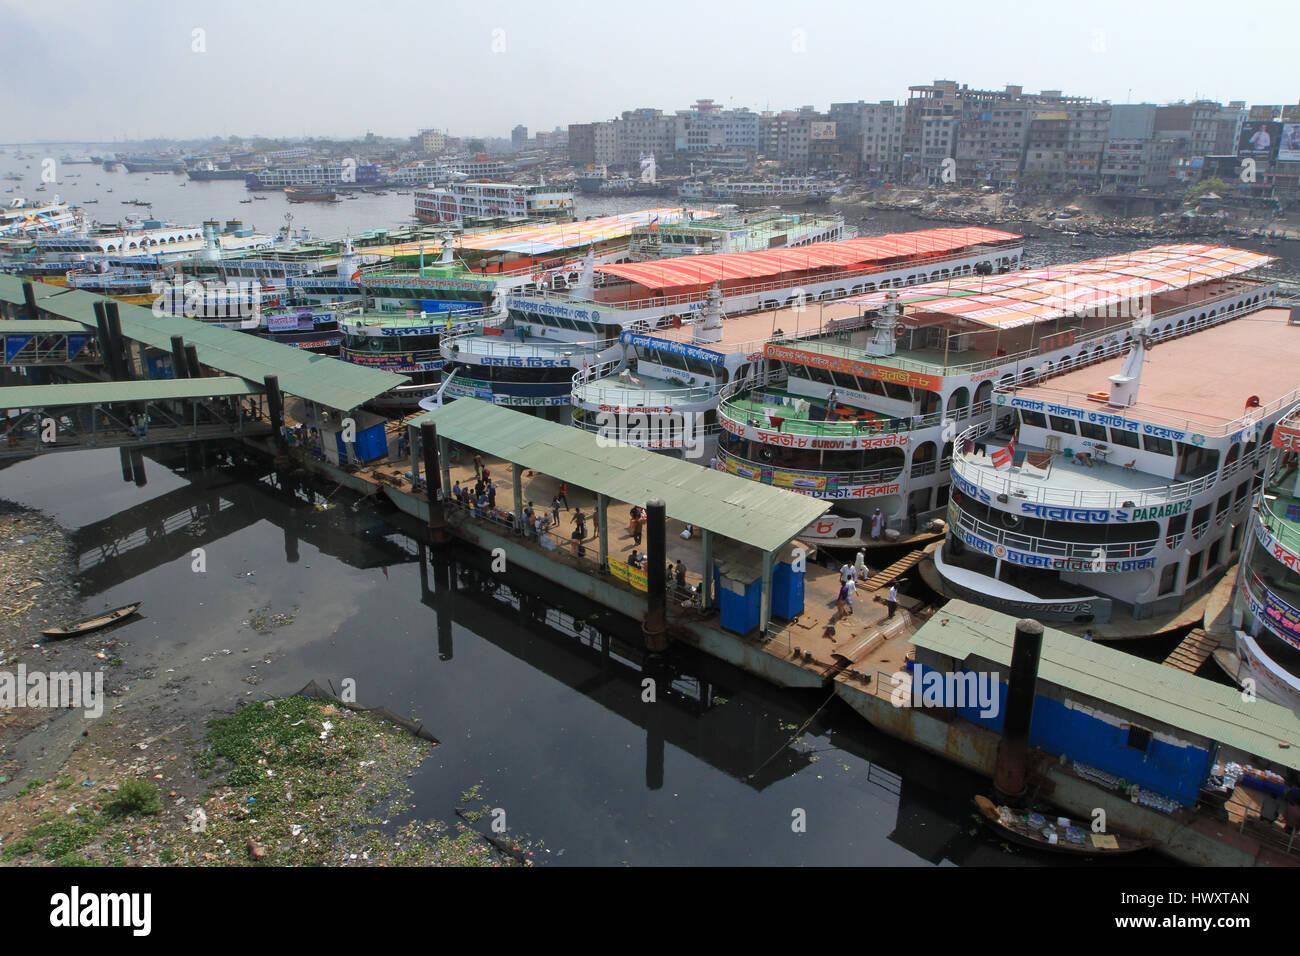 2014. Sadarghat launch terminal, Bangladesh. - Stock Image